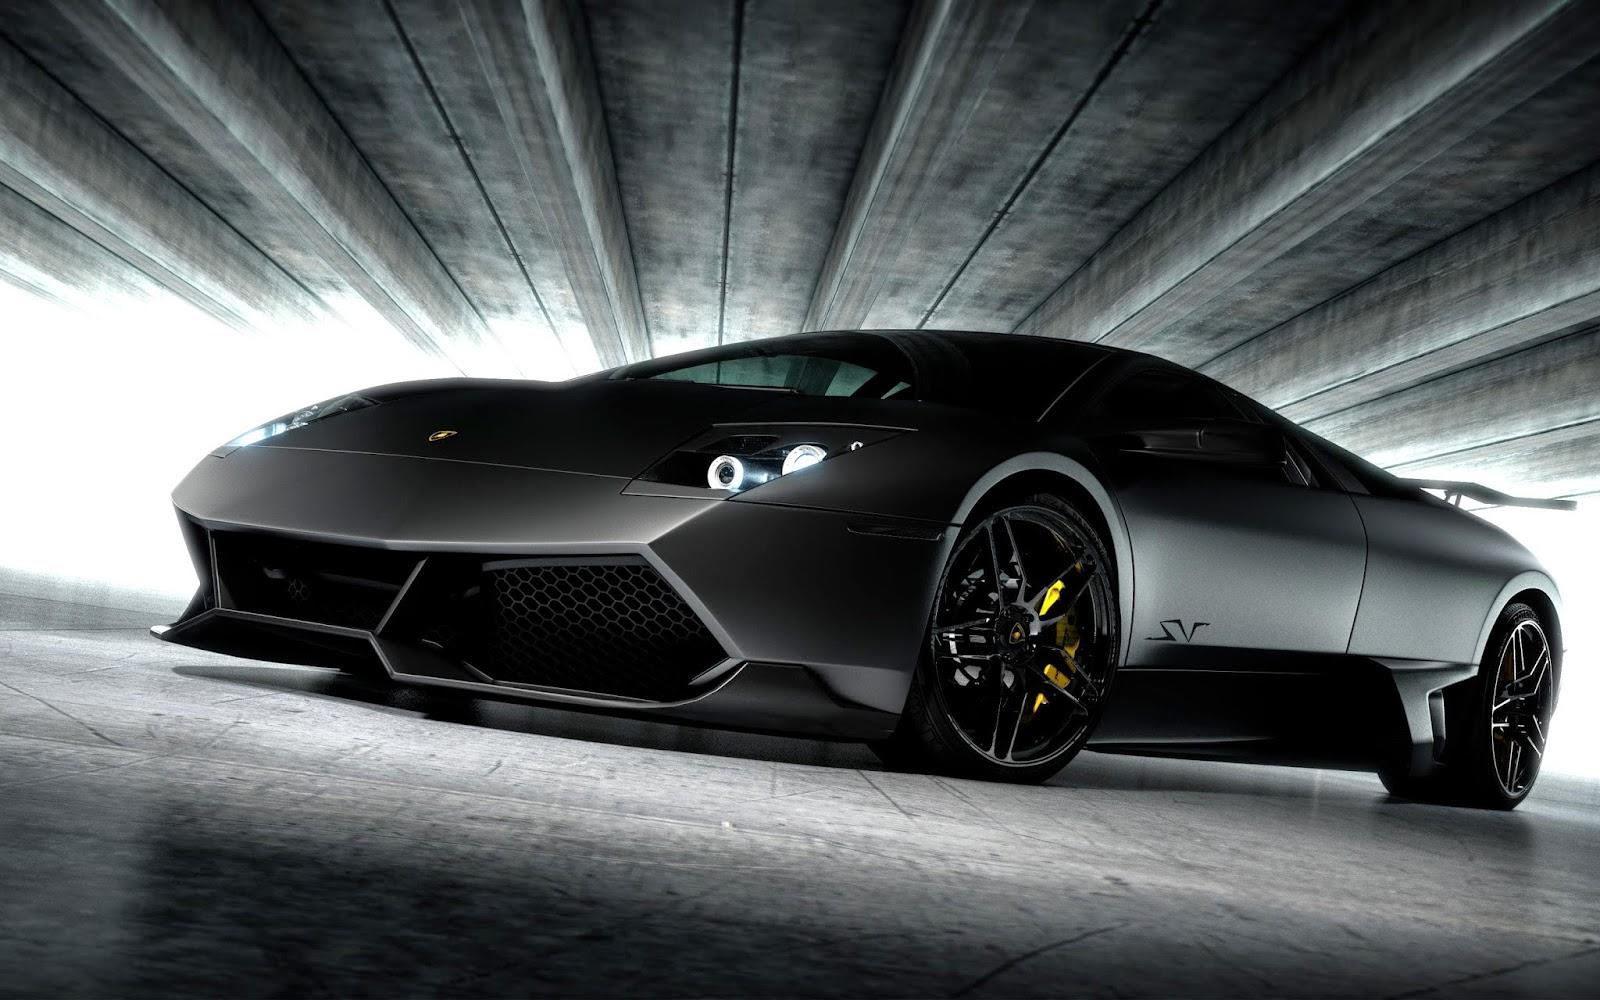 Lamborghini Murcielago Hd Lp670 4 Superveloce Wallpapers